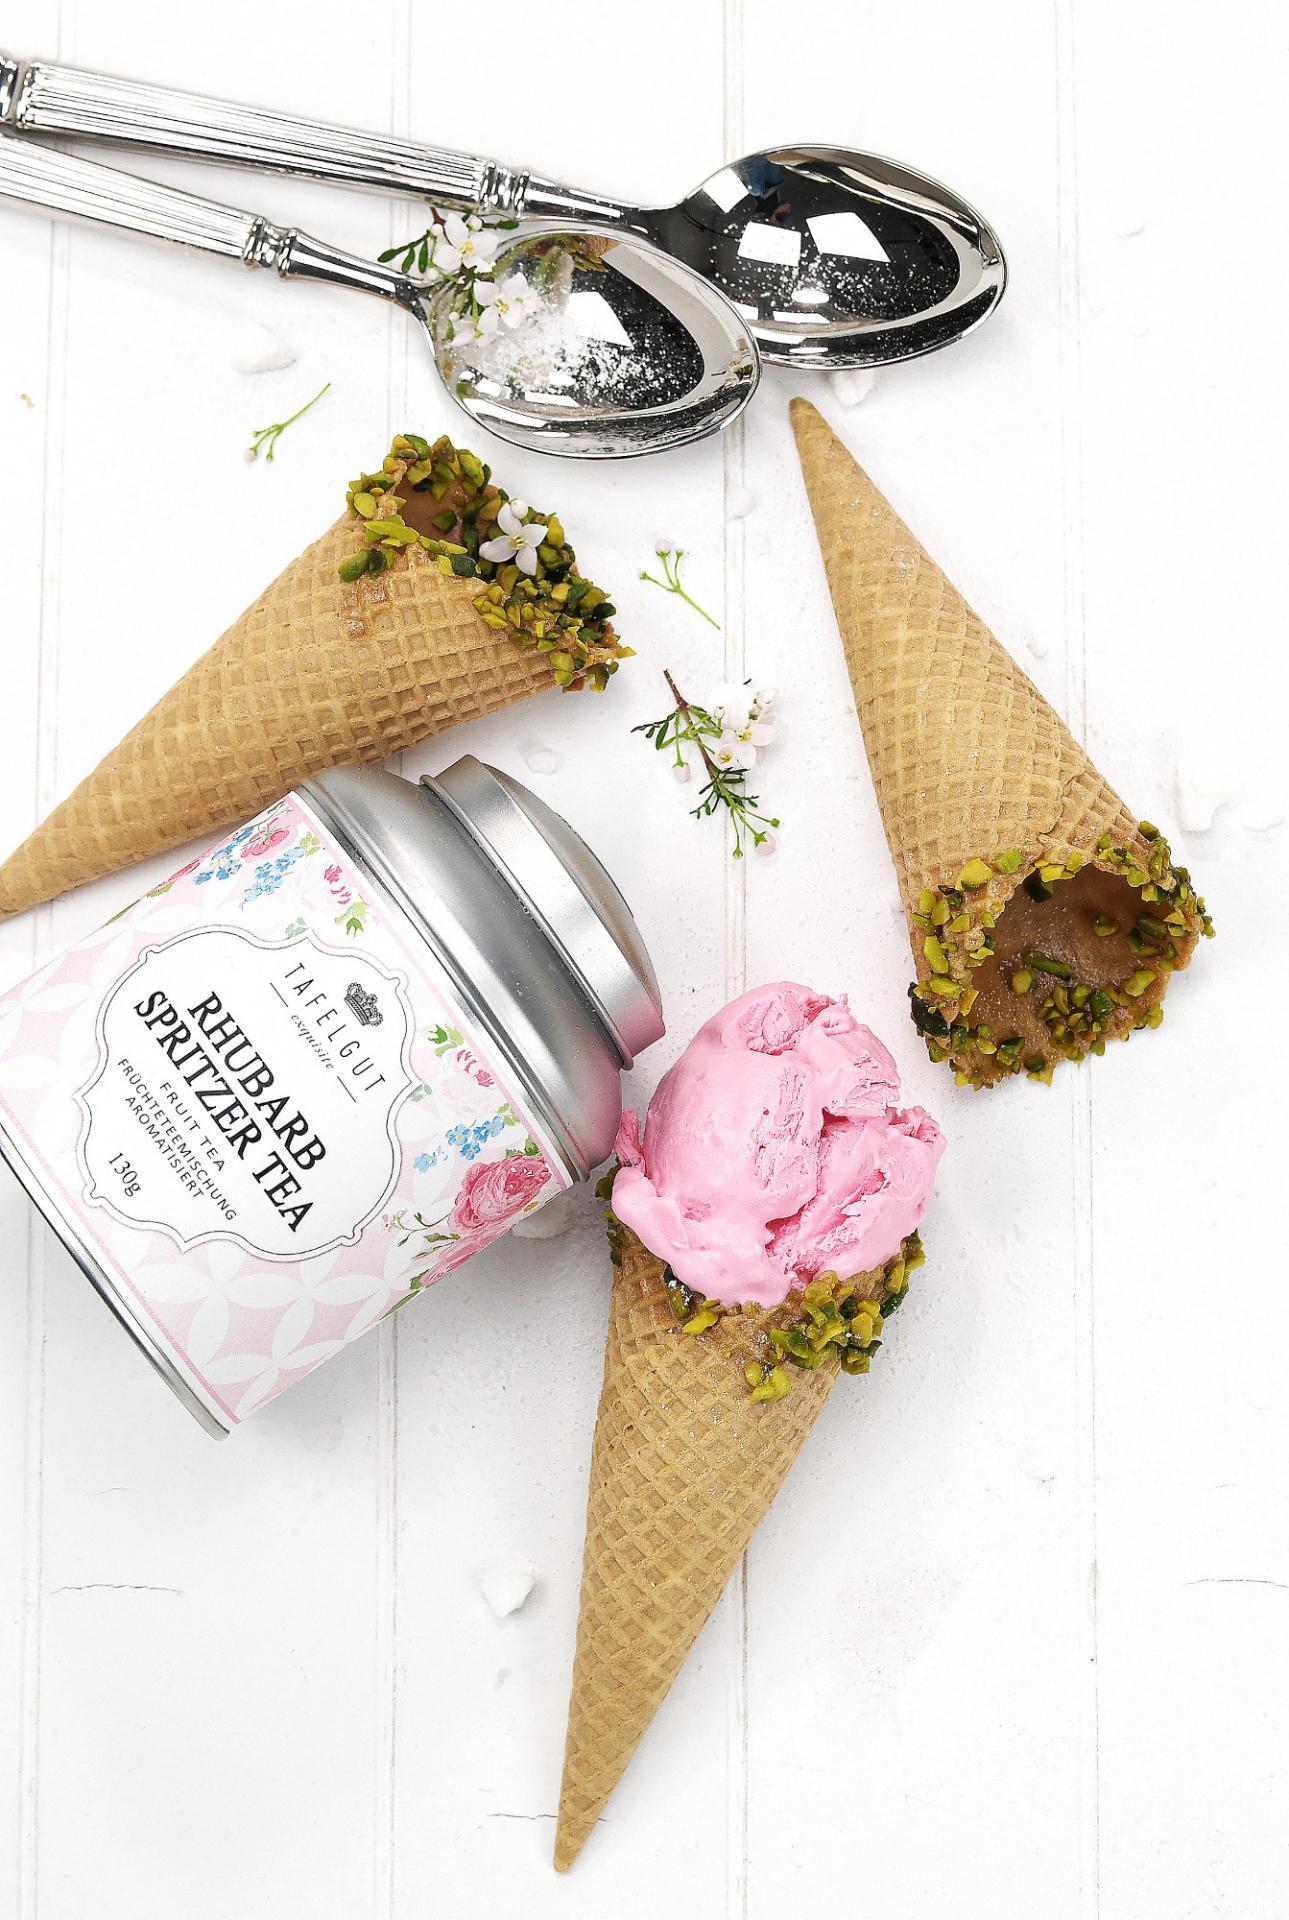 TAFELGUT Ovocný čaj Rhubarb spritzer tea - 130gr, růžová barva